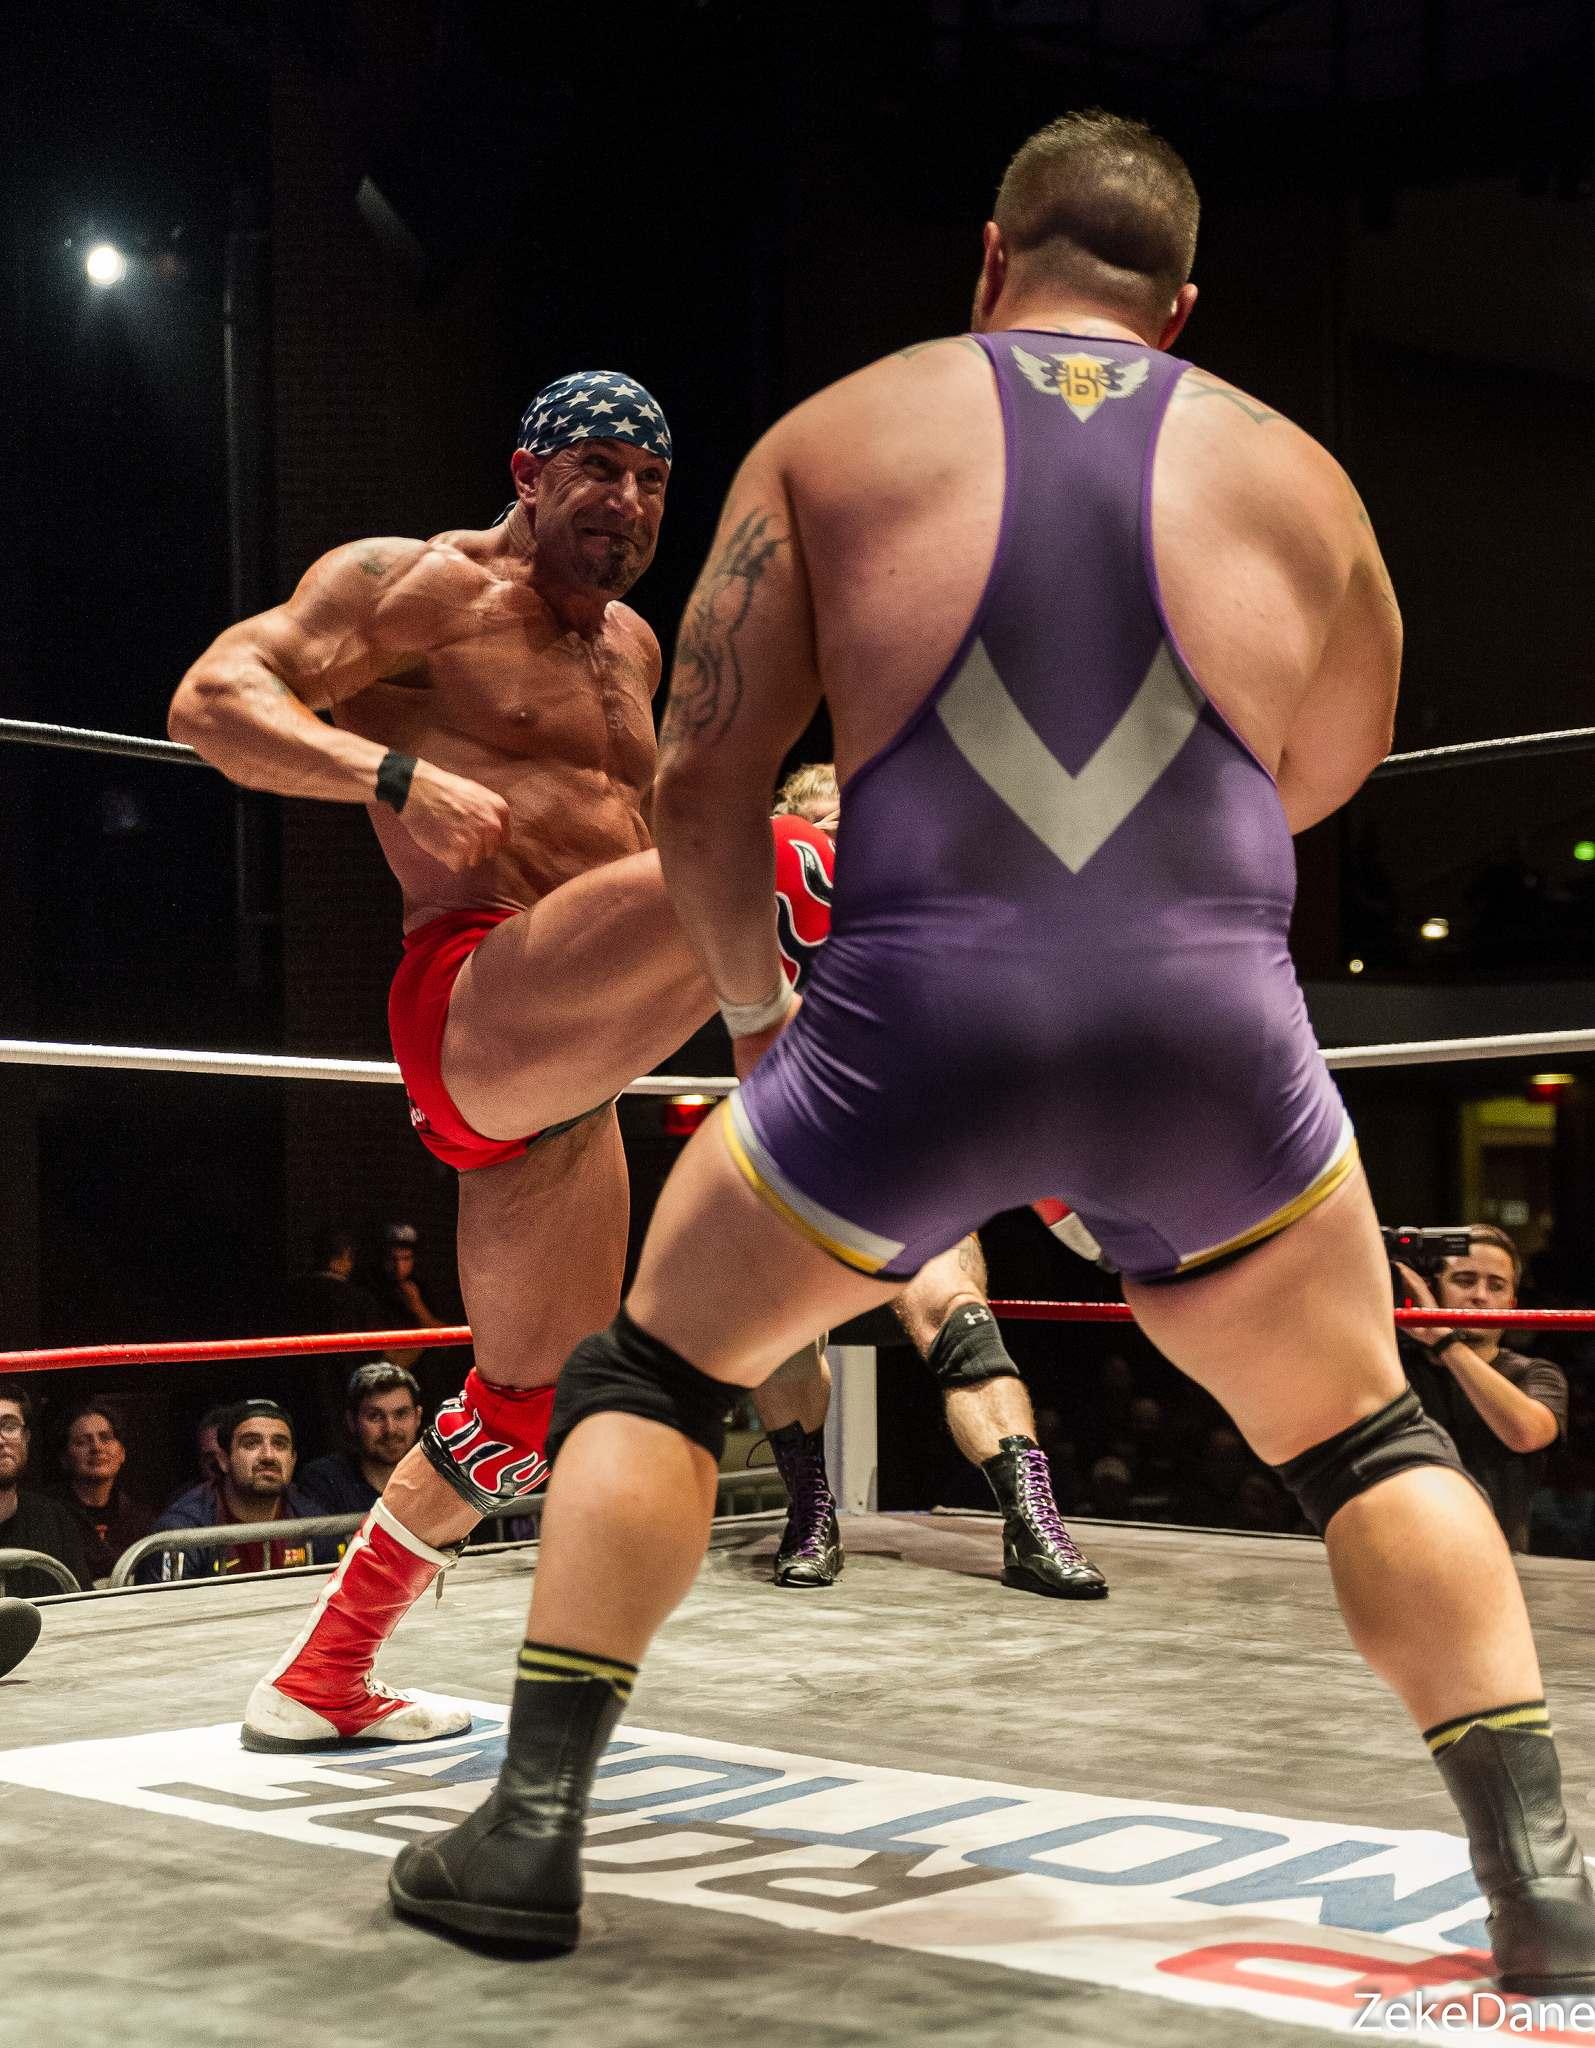 pro wrestling8 Pro Wrestling in New England 2016